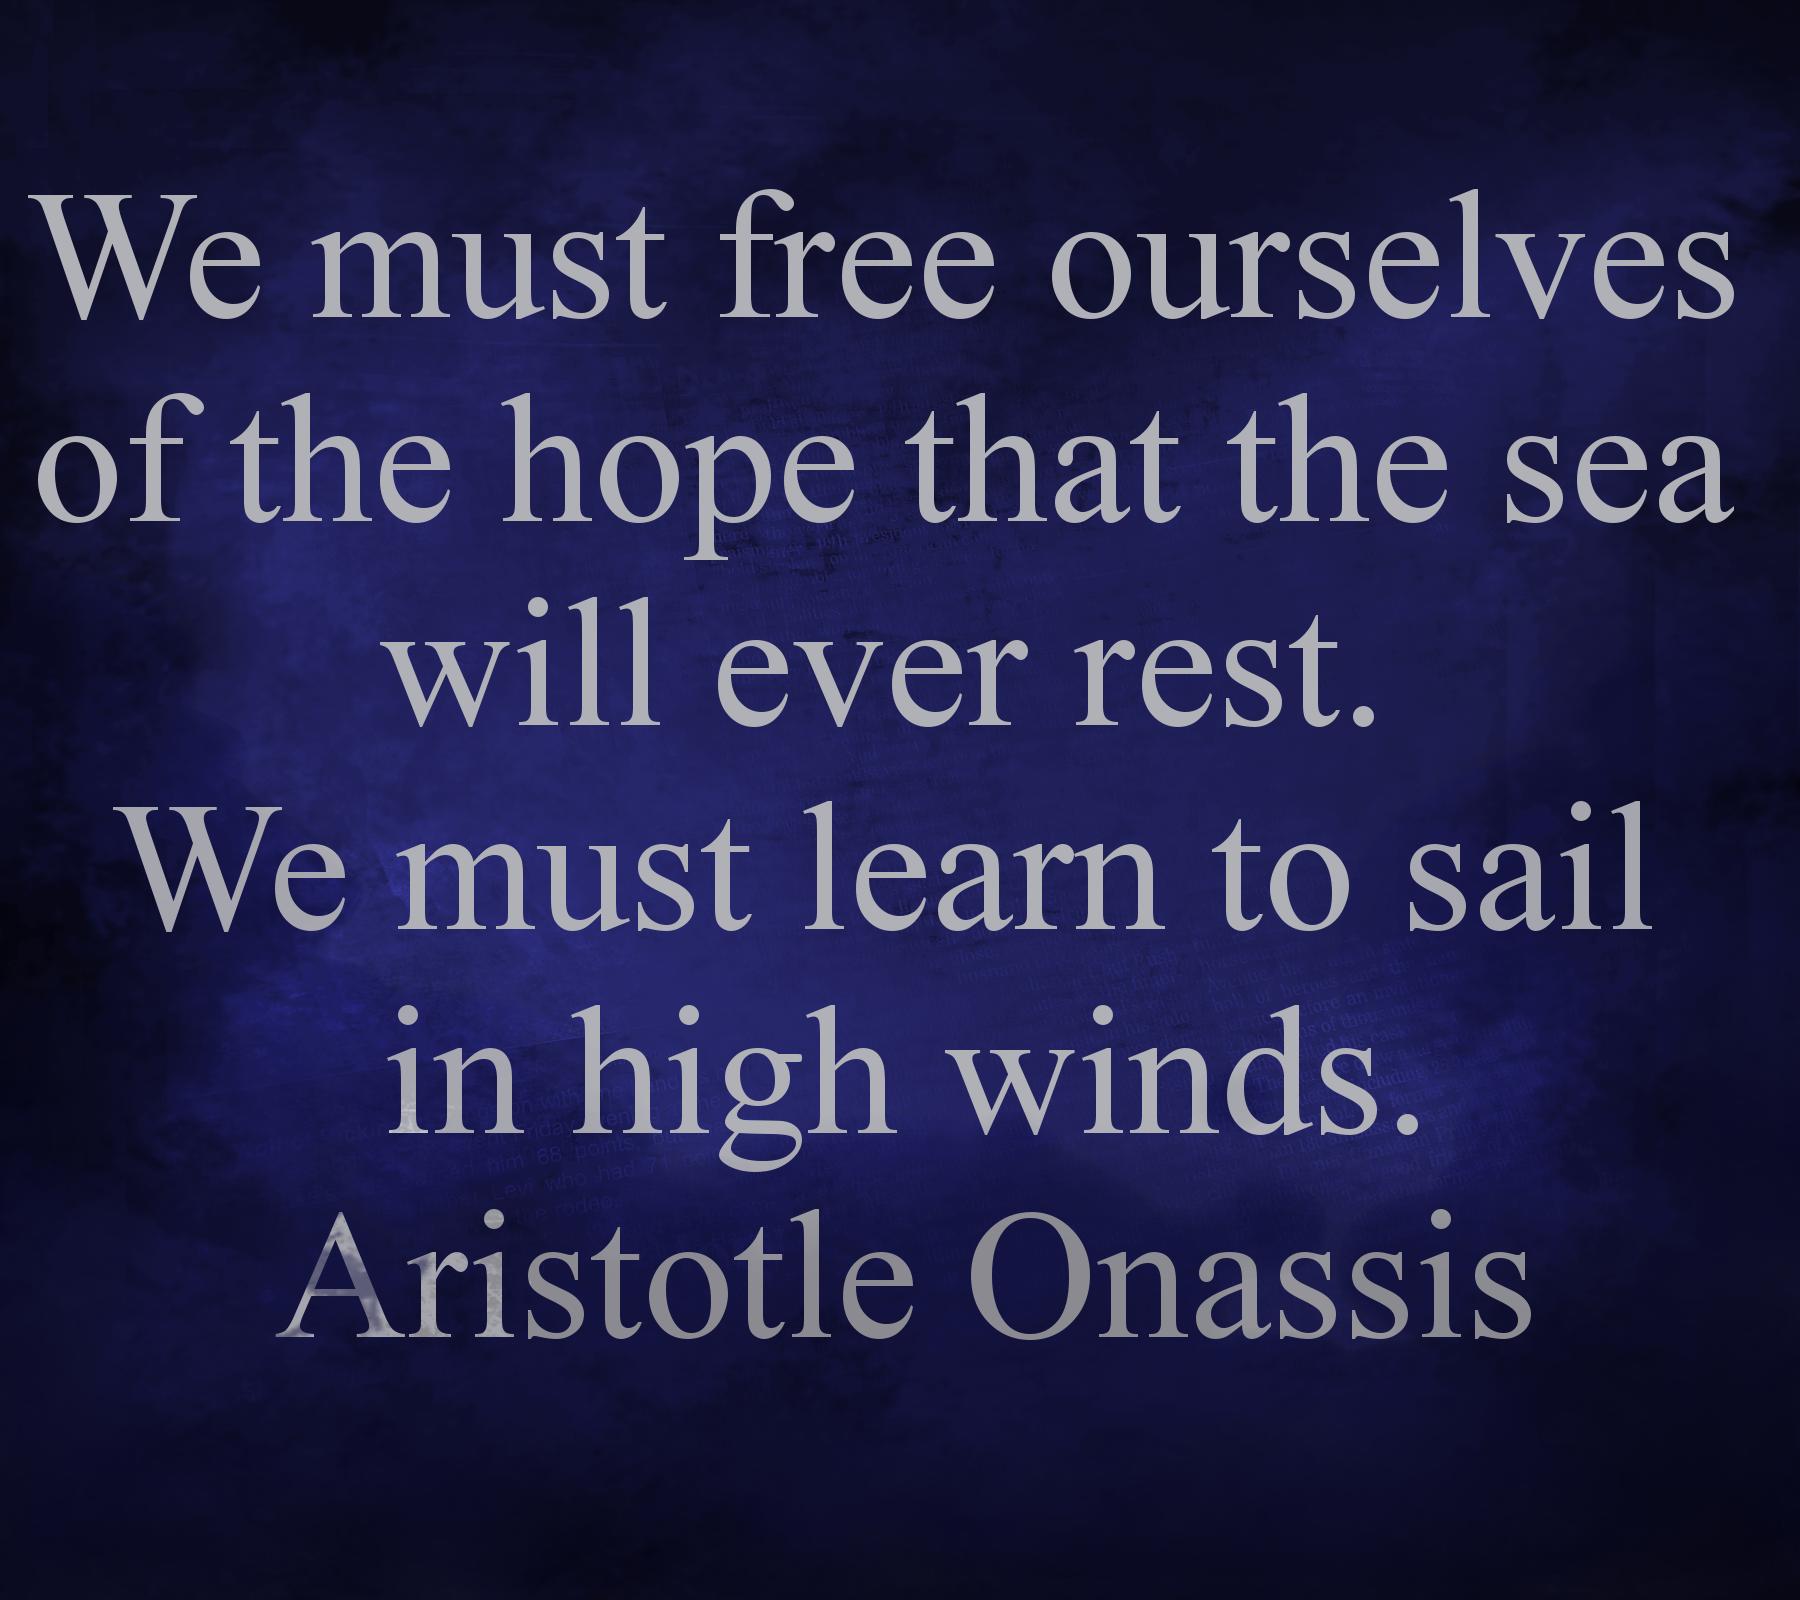 Aristotle Onassis Aristotle Quotes Words Of Wisdom Inspirational Quotes